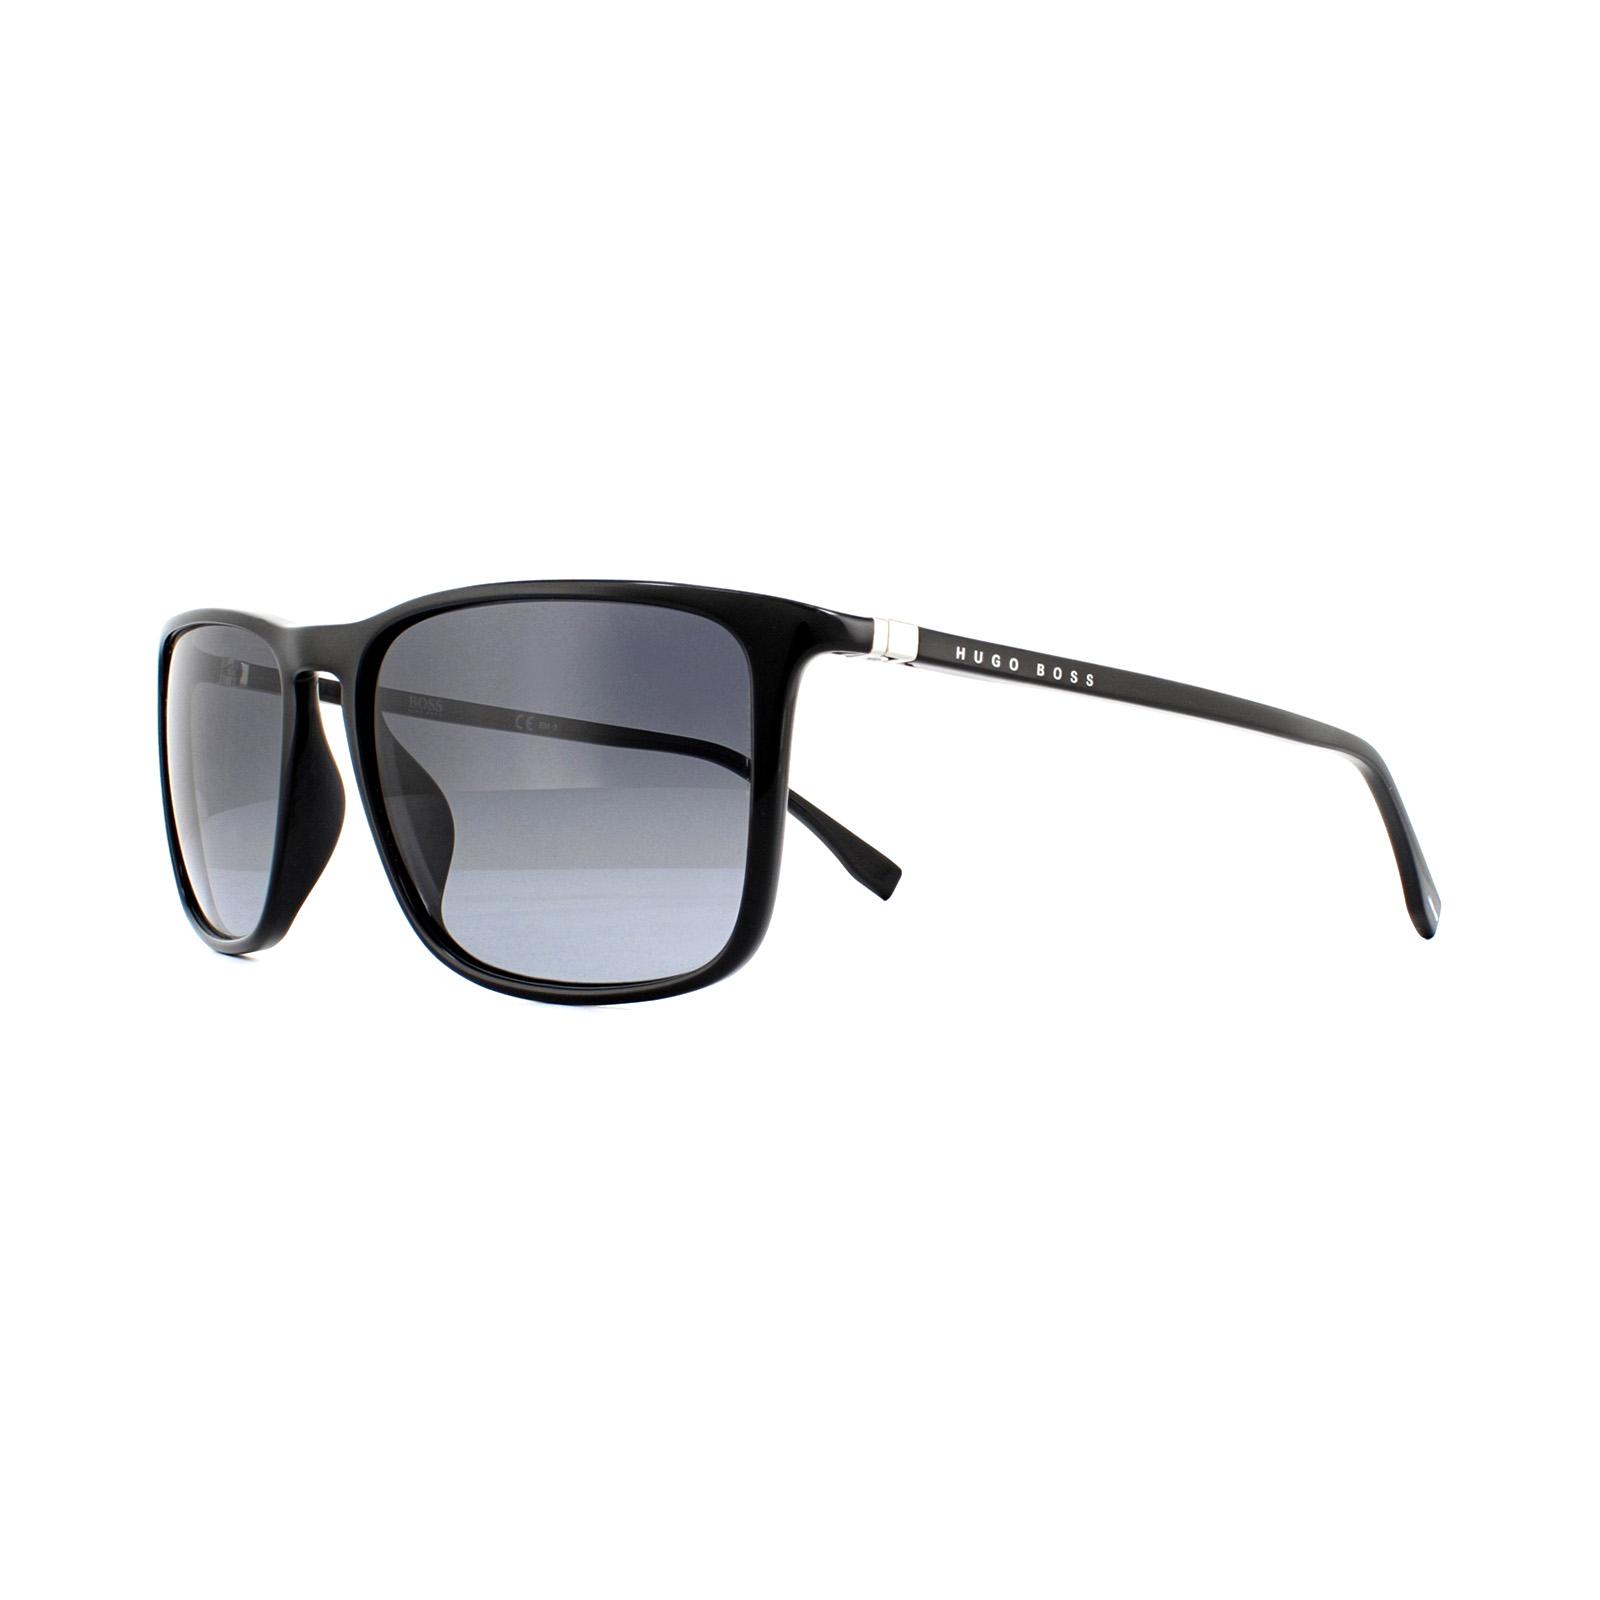 4e64233ea718a Sentinel Hugo Boss Sunglasses 0665 N S 807 9O Black Dark Grey Gradient